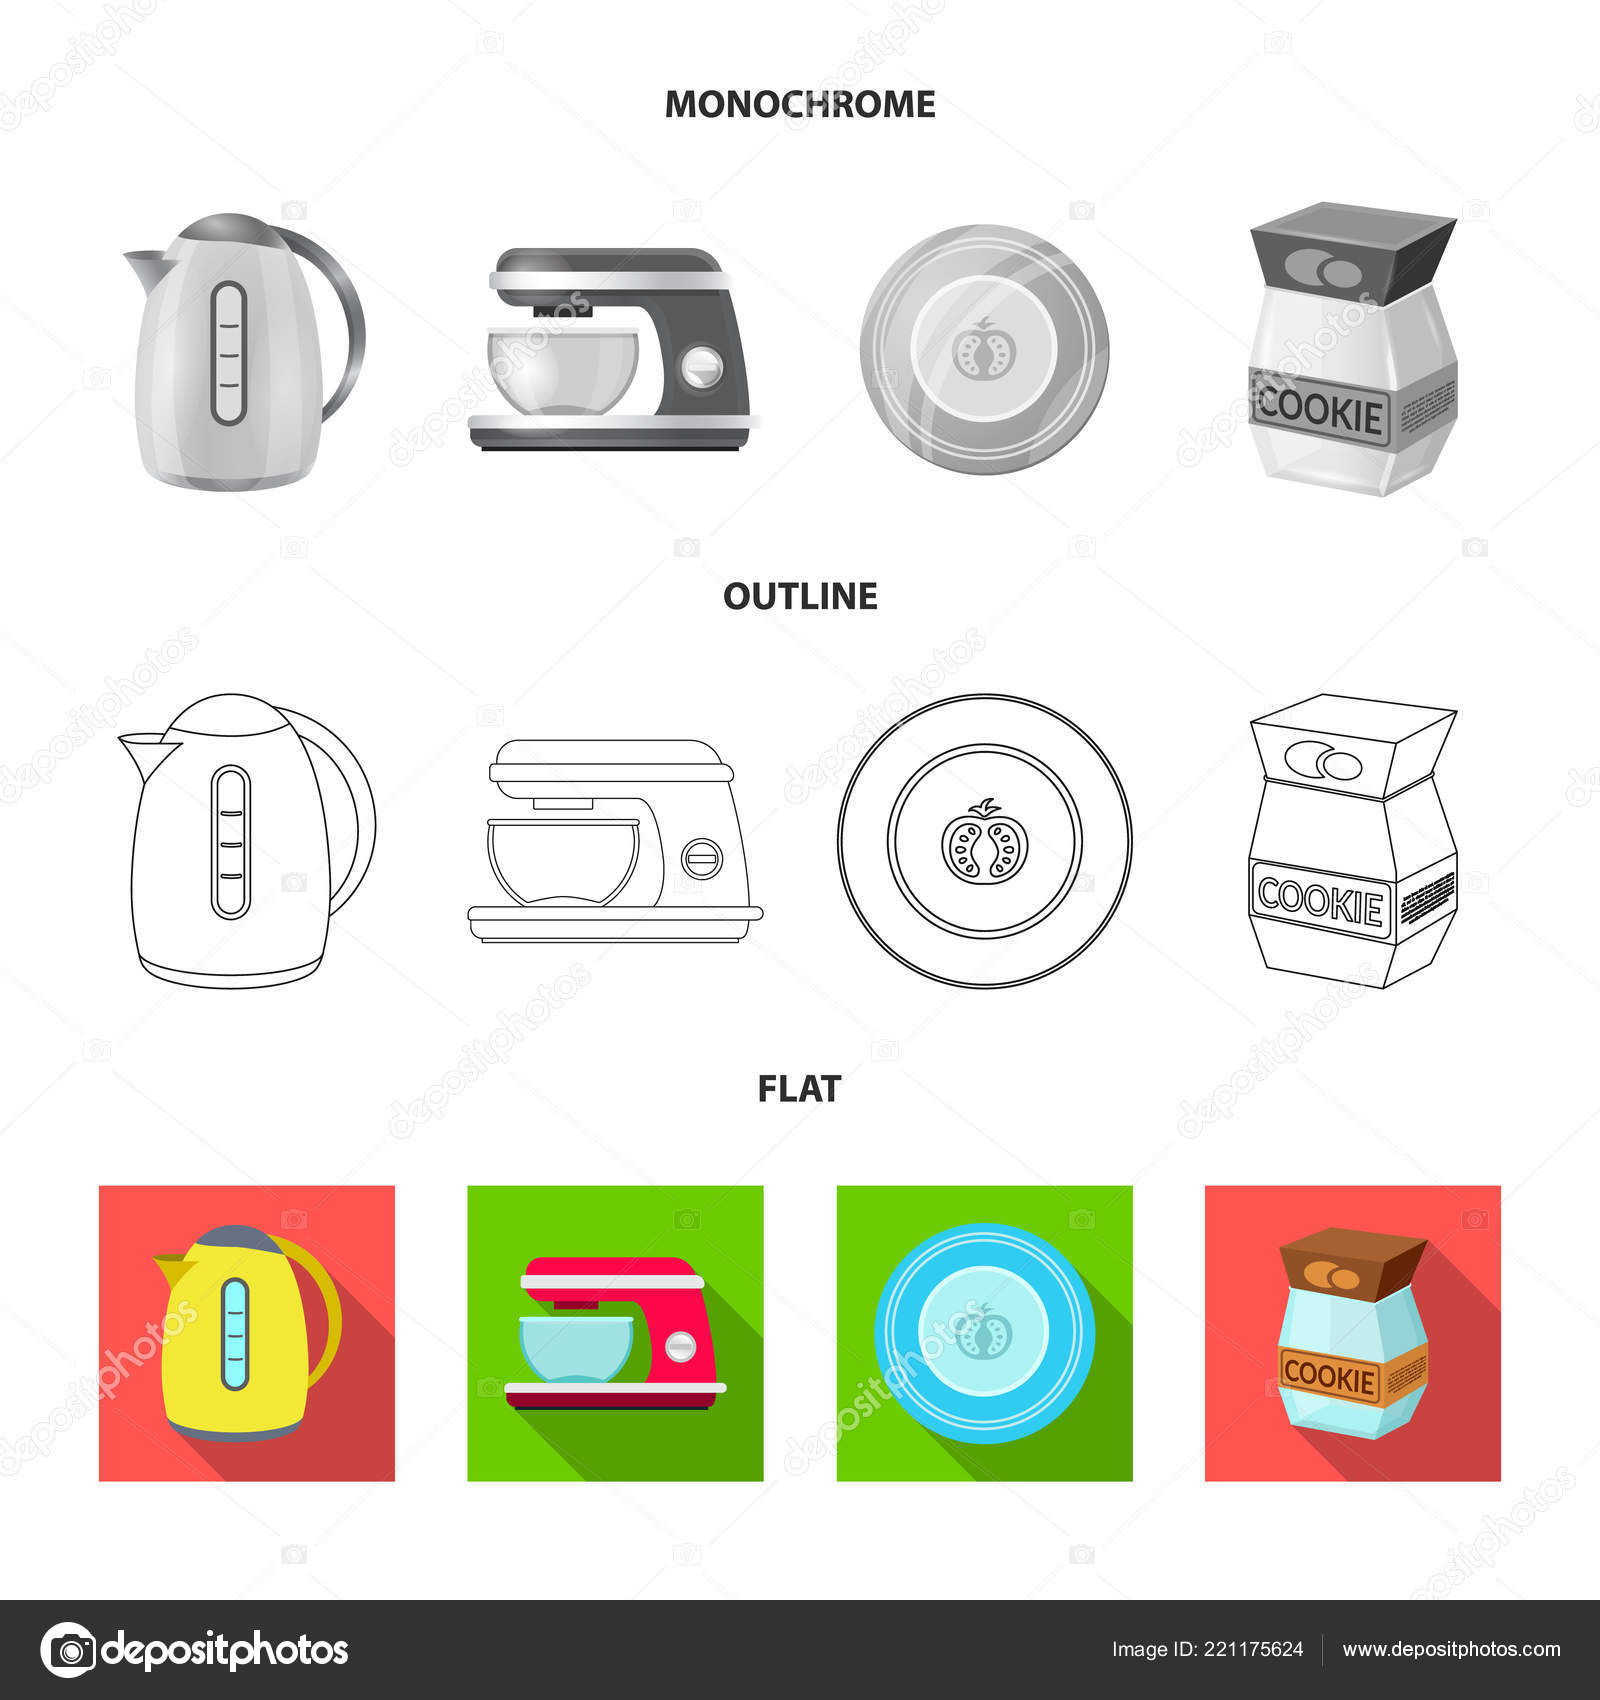 in stock kitchens kitchen cabinets ideas 厨房和烹饪标志的矢量设计 库存厨房和家电矢量图标收藏 图库矢量图像